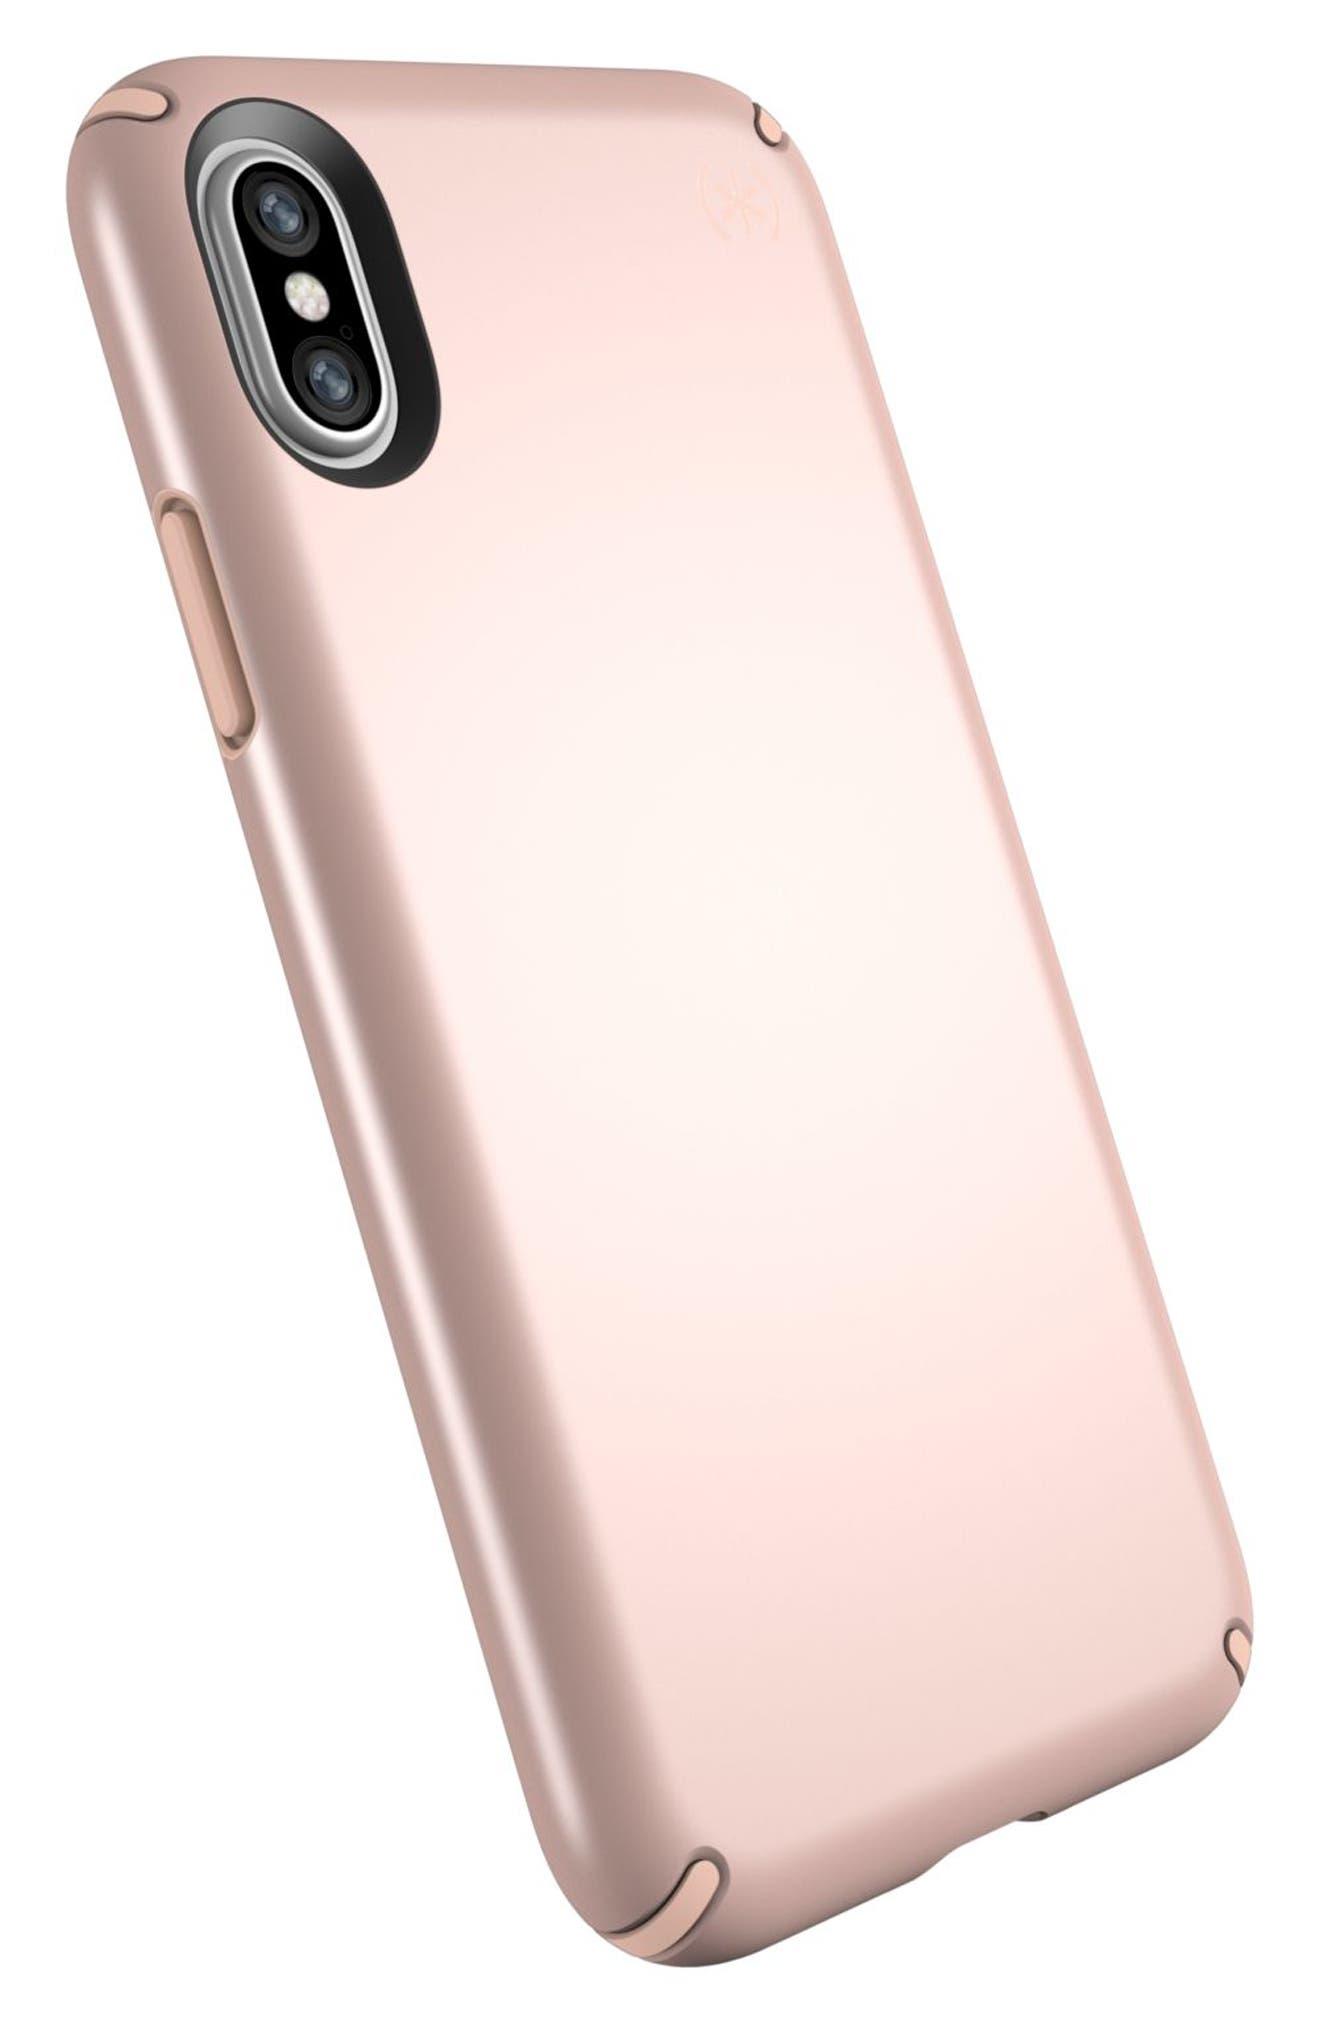 iPhone X Case,                             Alternate thumbnail 4, color,                             Rose Gold Metallic/ Peach